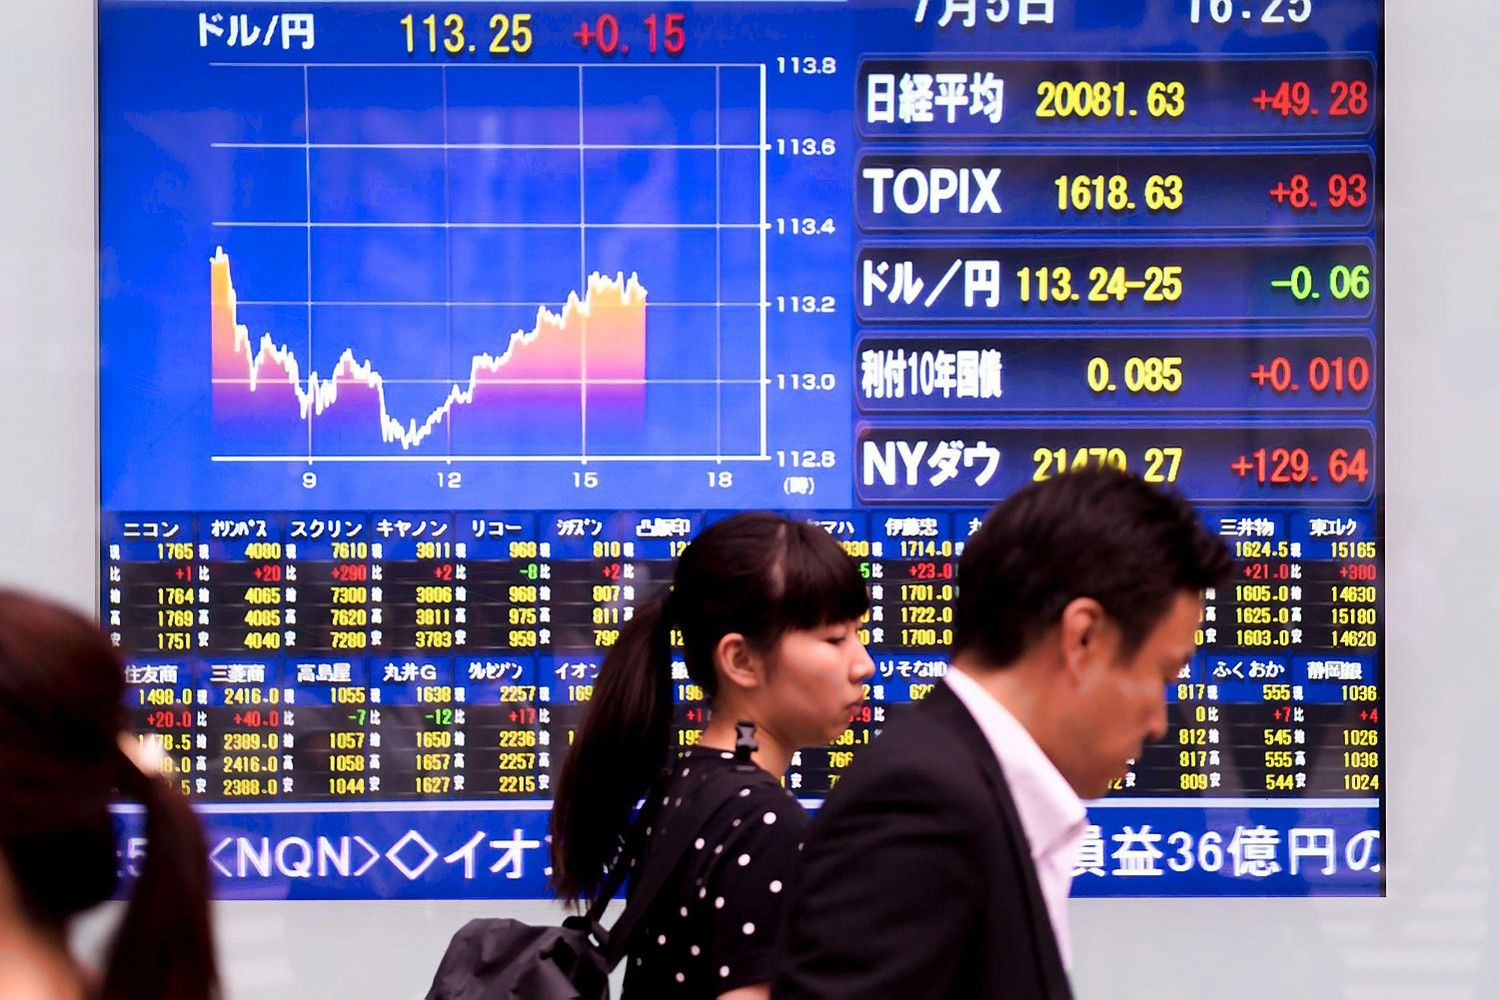 Yen Gains, Asia Stocks Stall on Trump Nafta Remark: Markets Wrap